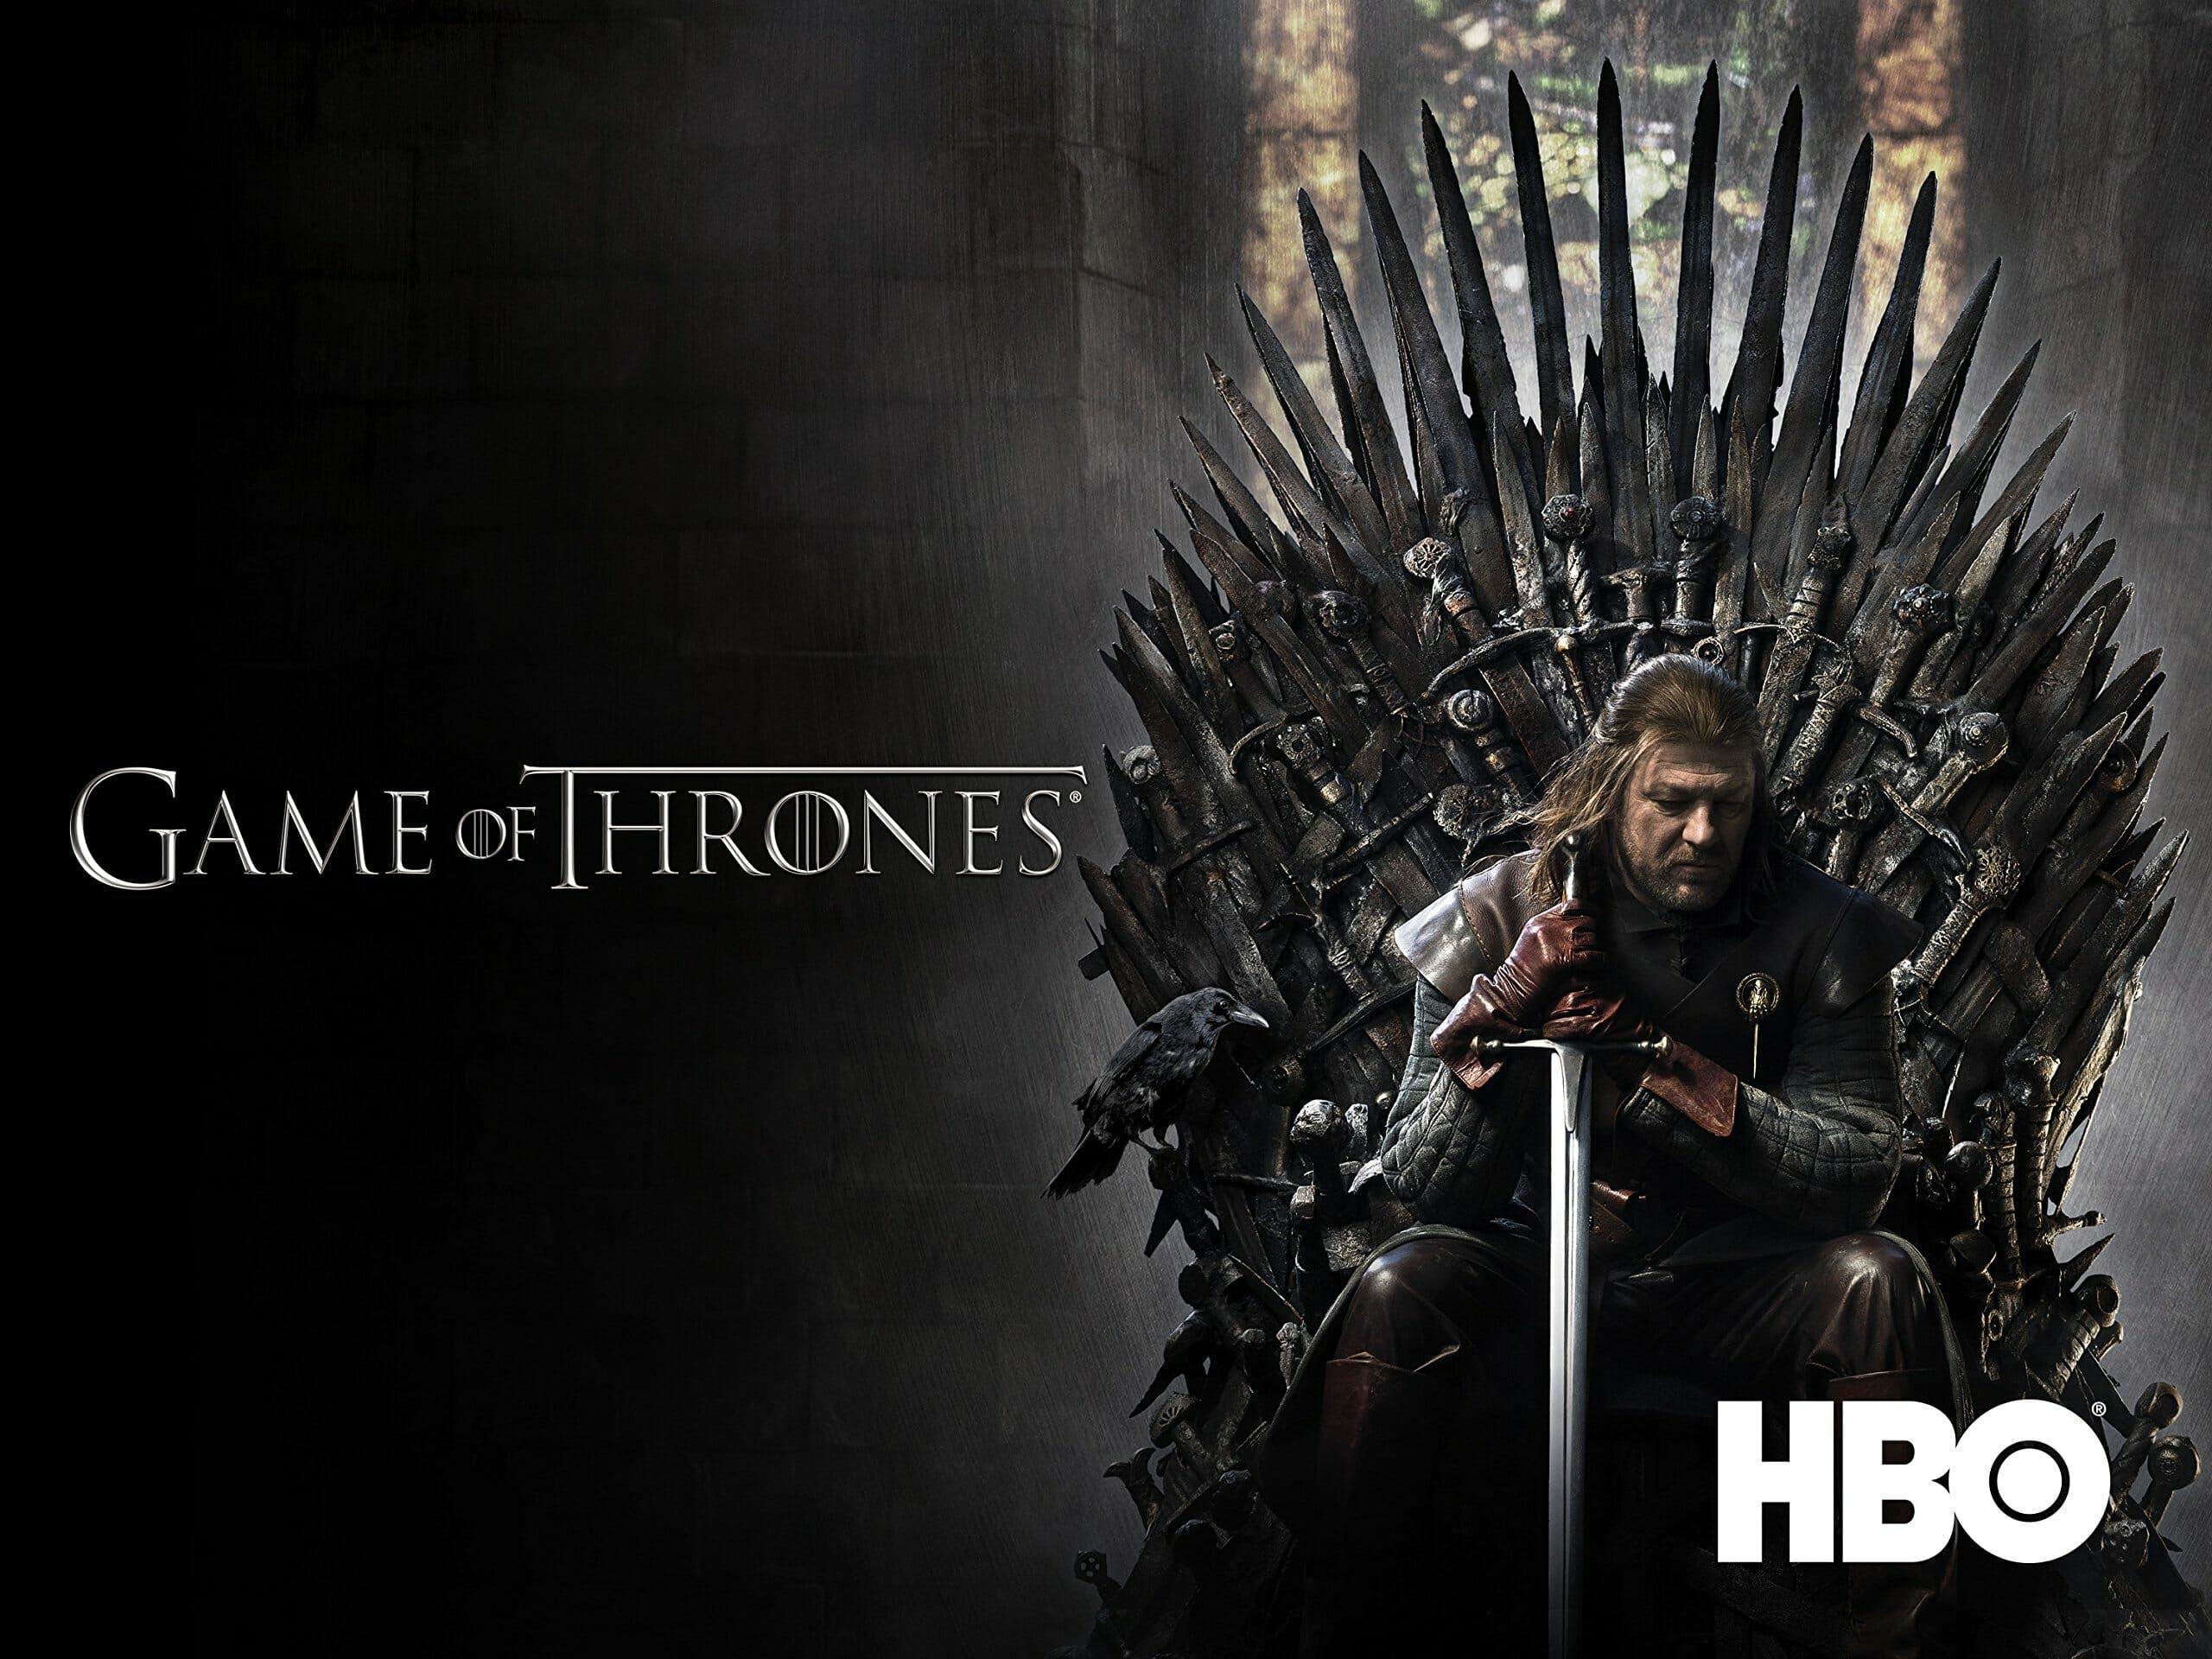 watch game of thrones season 8 episode 3 online free on Amazon